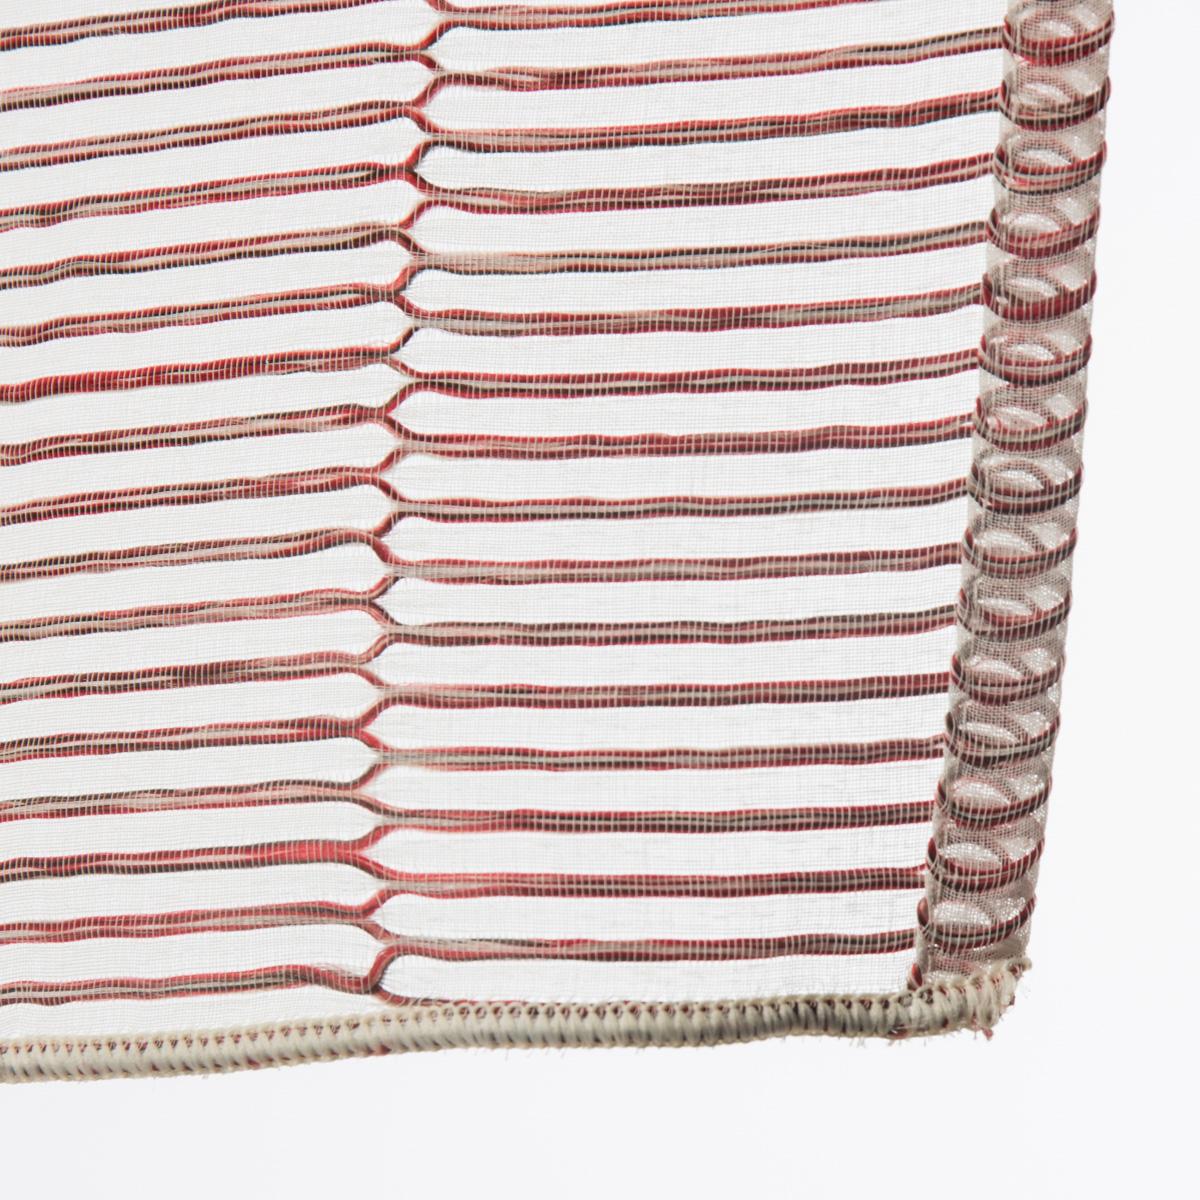 fertiggardine fertigvorhang senschal mit metall sen enge streifen rot 145x245cm fertiggardinen. Black Bedroom Furniture Sets. Home Design Ideas